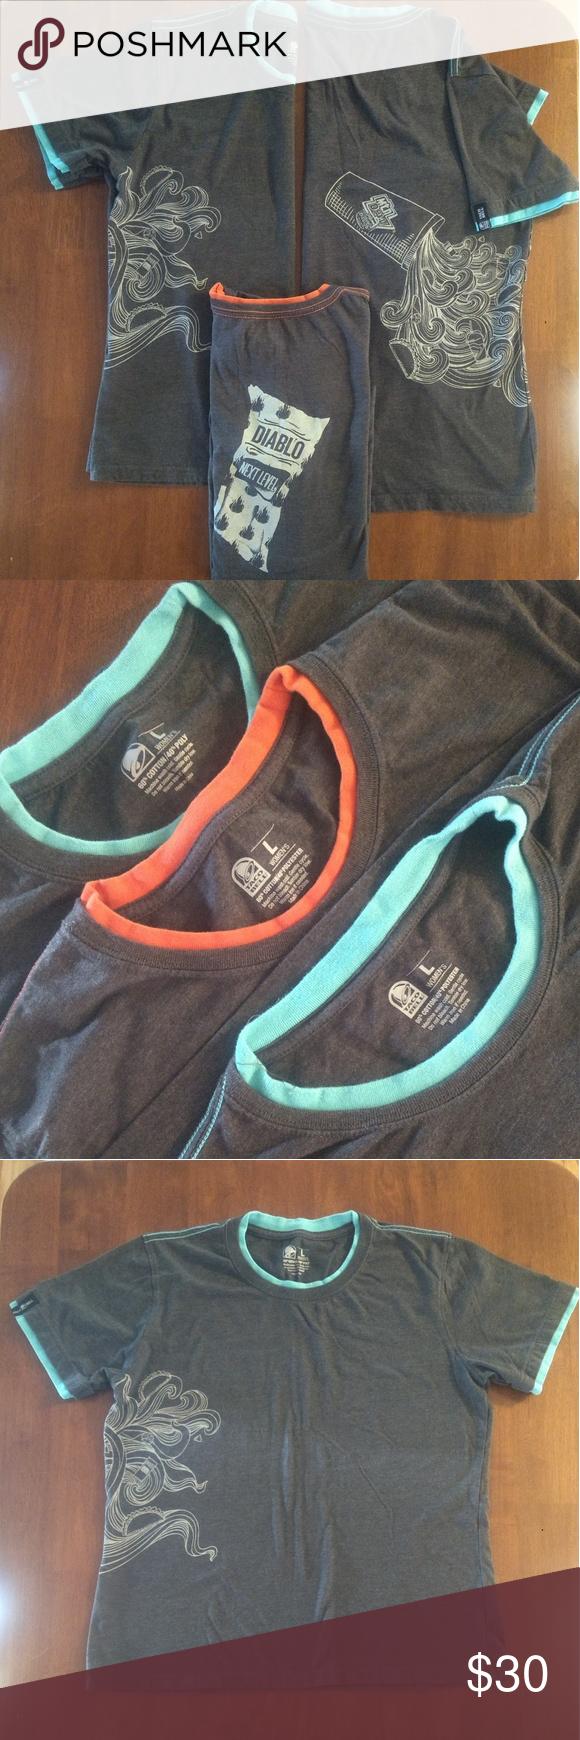 Taco Bell TShirts (Employee Uniform) Bundle of 3